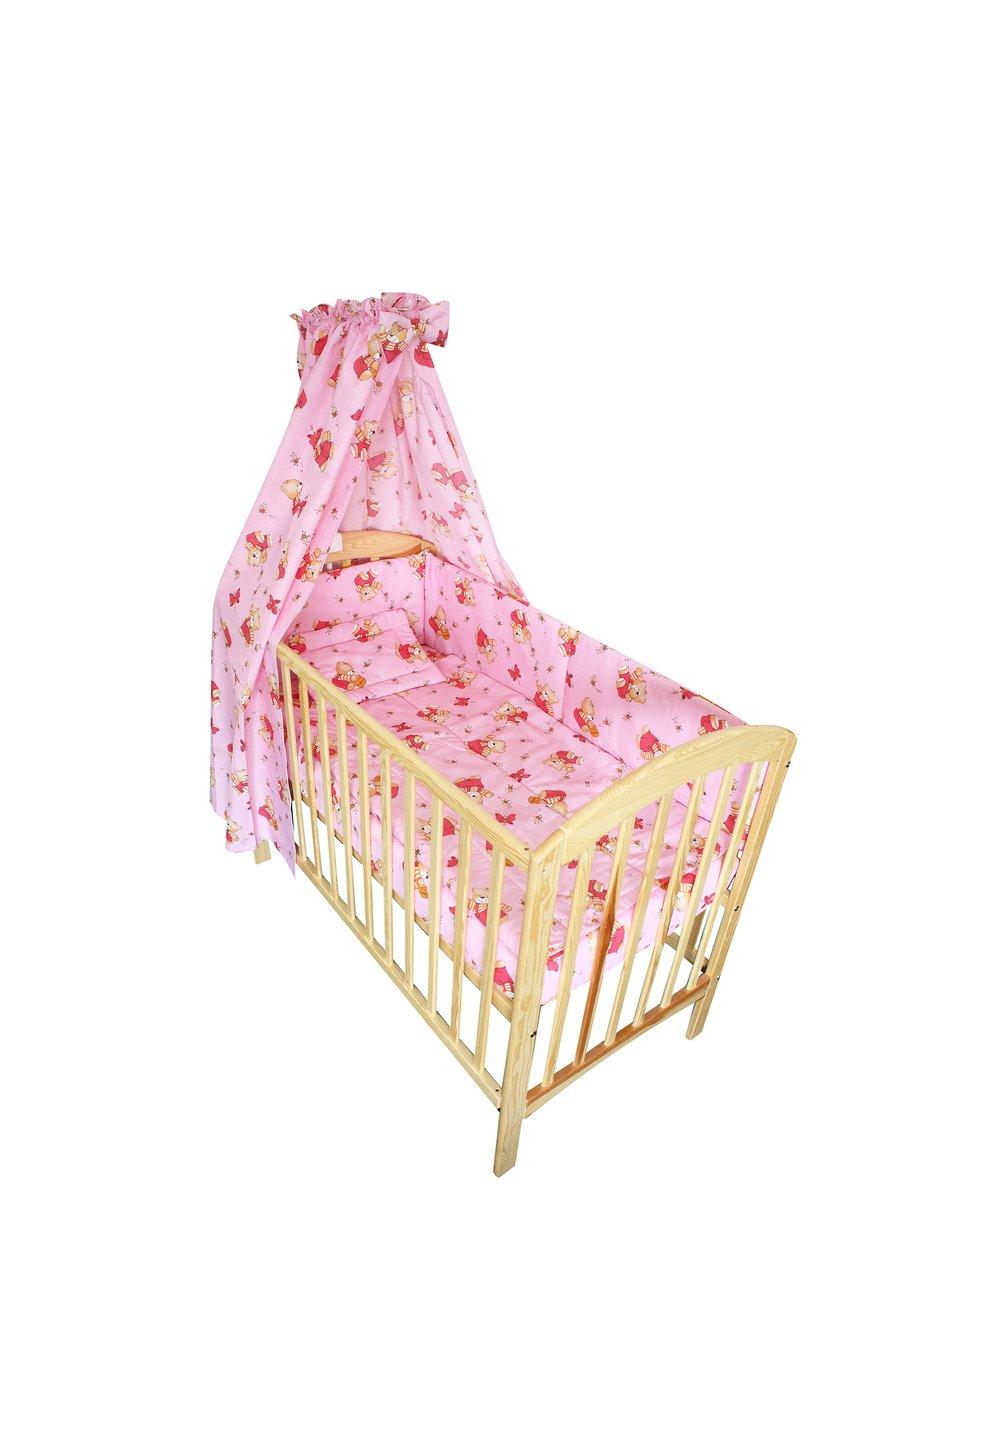 Lenjerie cu baldachin, ursulet cu albinute roz, 120 x 60 cm imagine